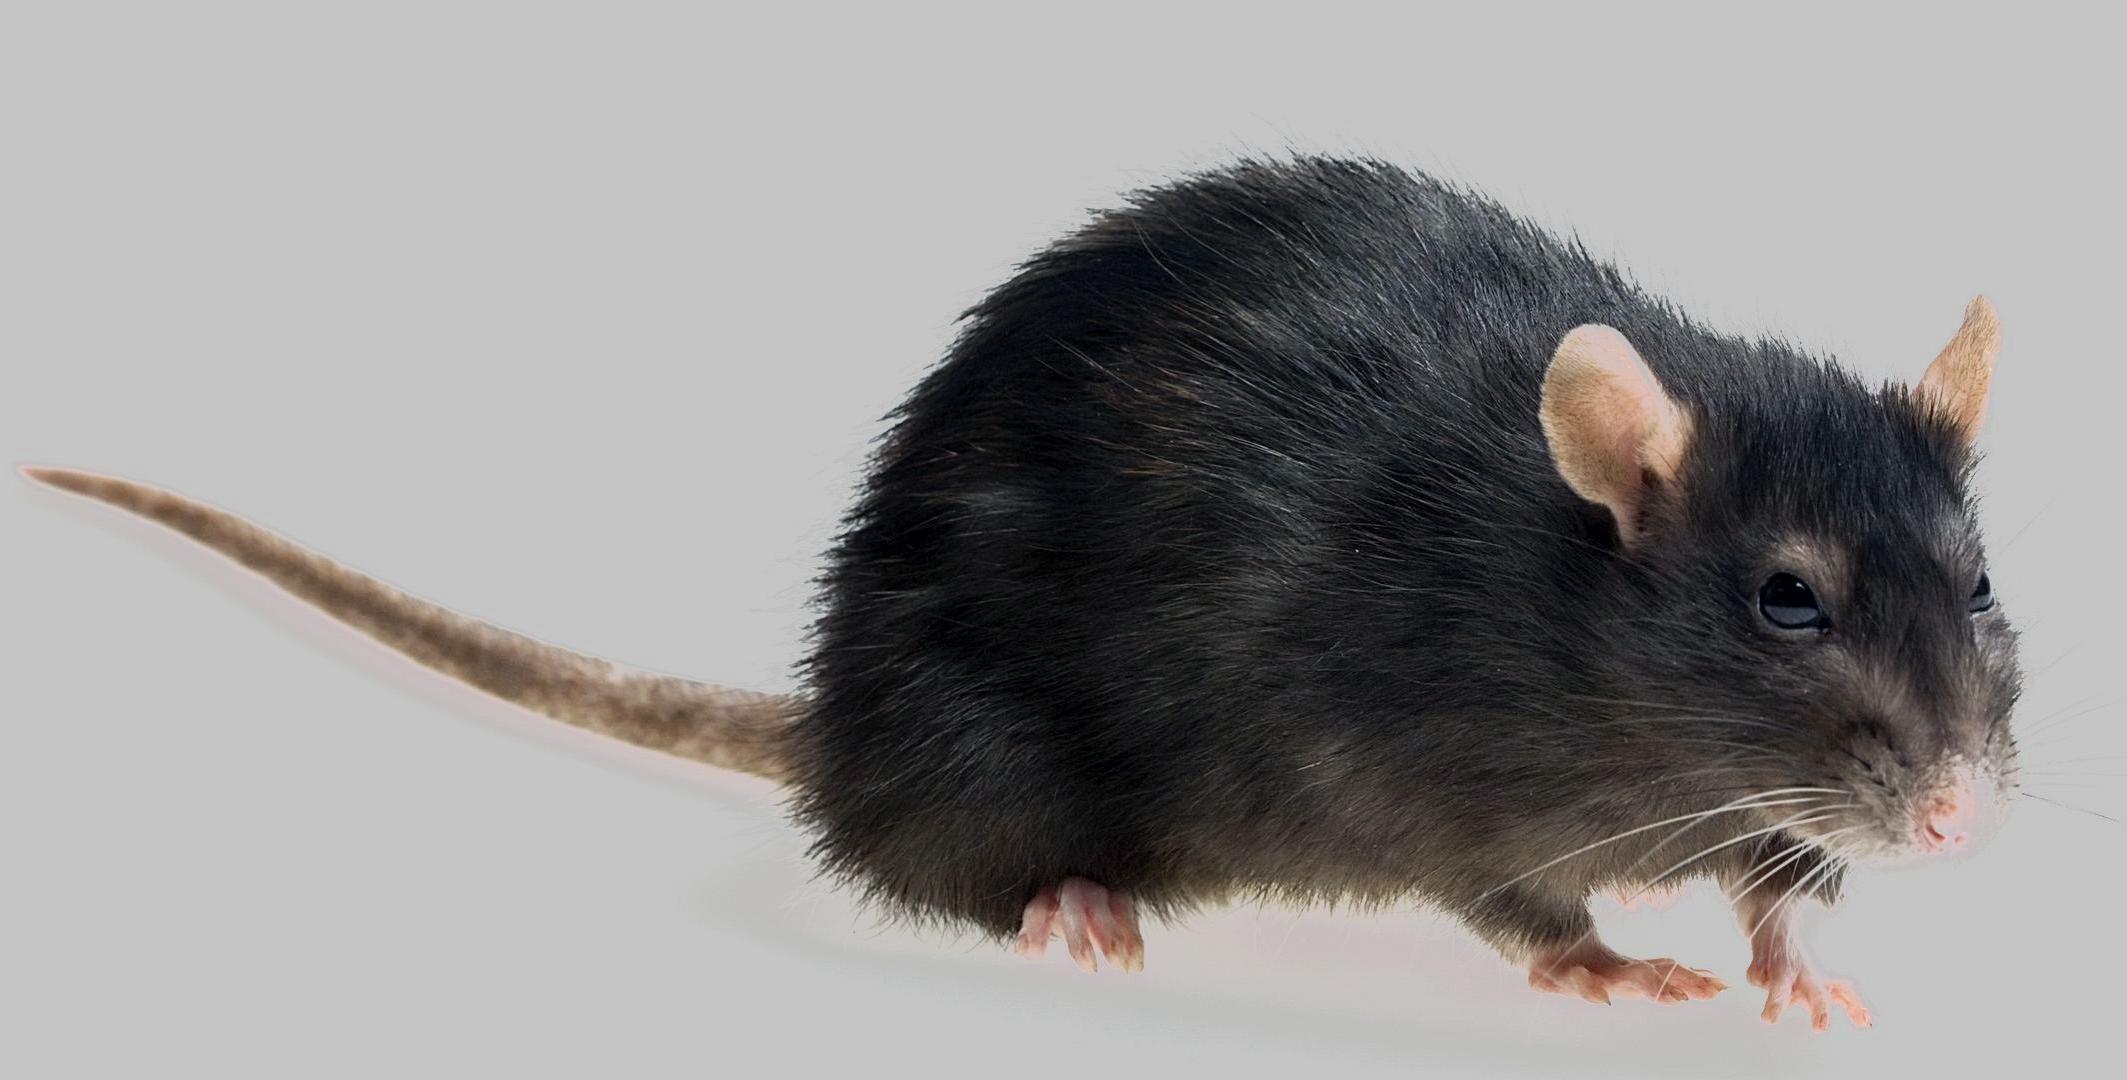 Rat dream meaning, dream about rat, rat dream interpretation, seeing in a dream rat